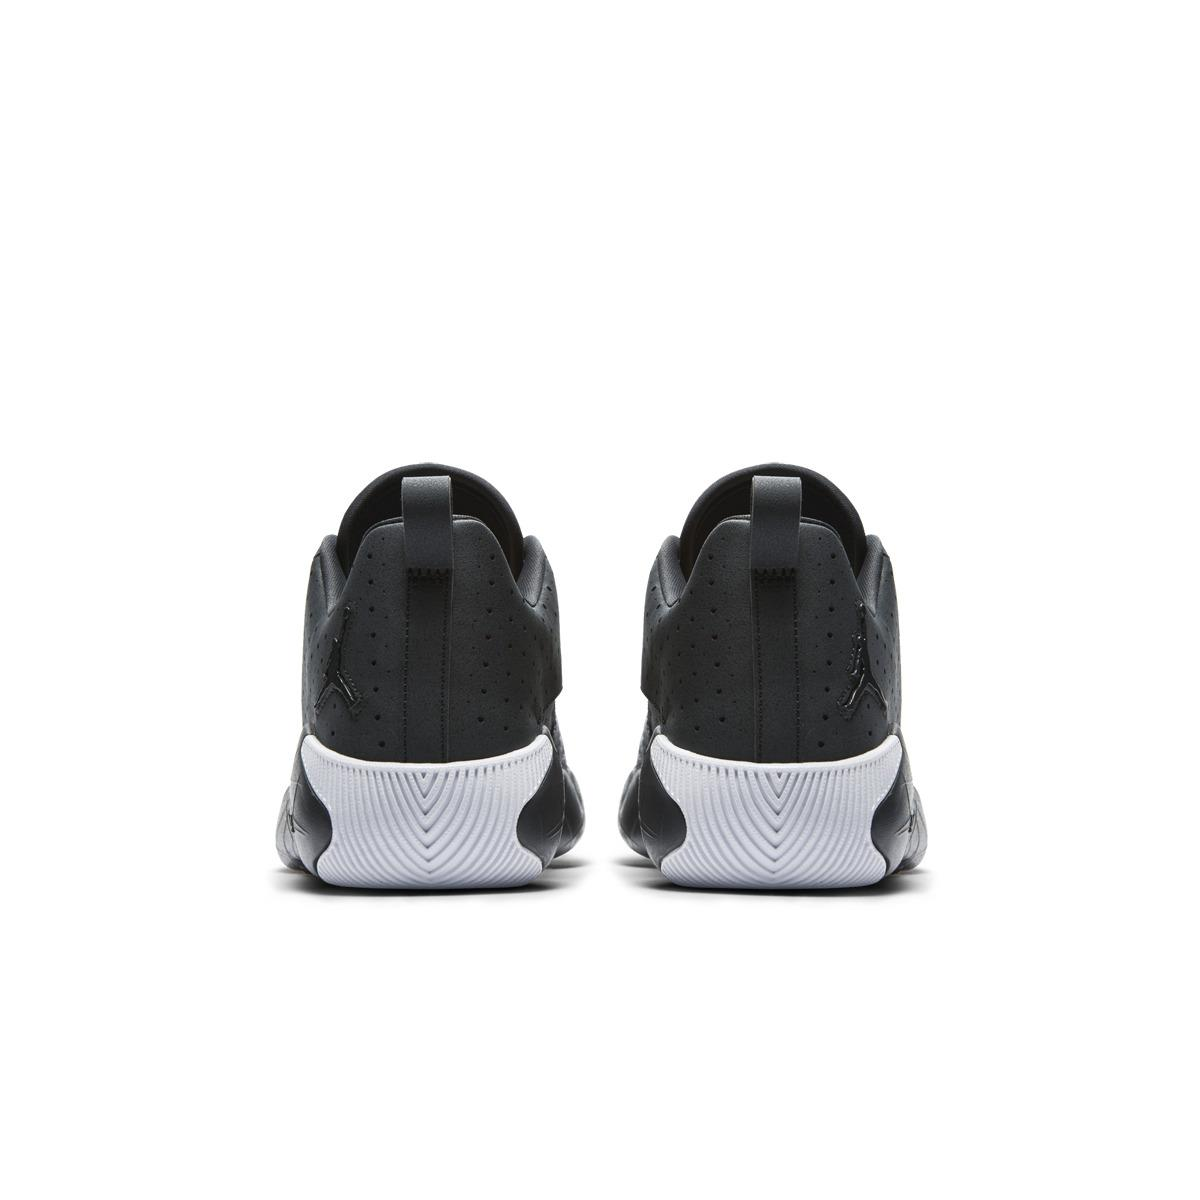 74576b5b6167 Nike Jordan 23 Breakout Casual Trainers in Gray for Men - Lyst